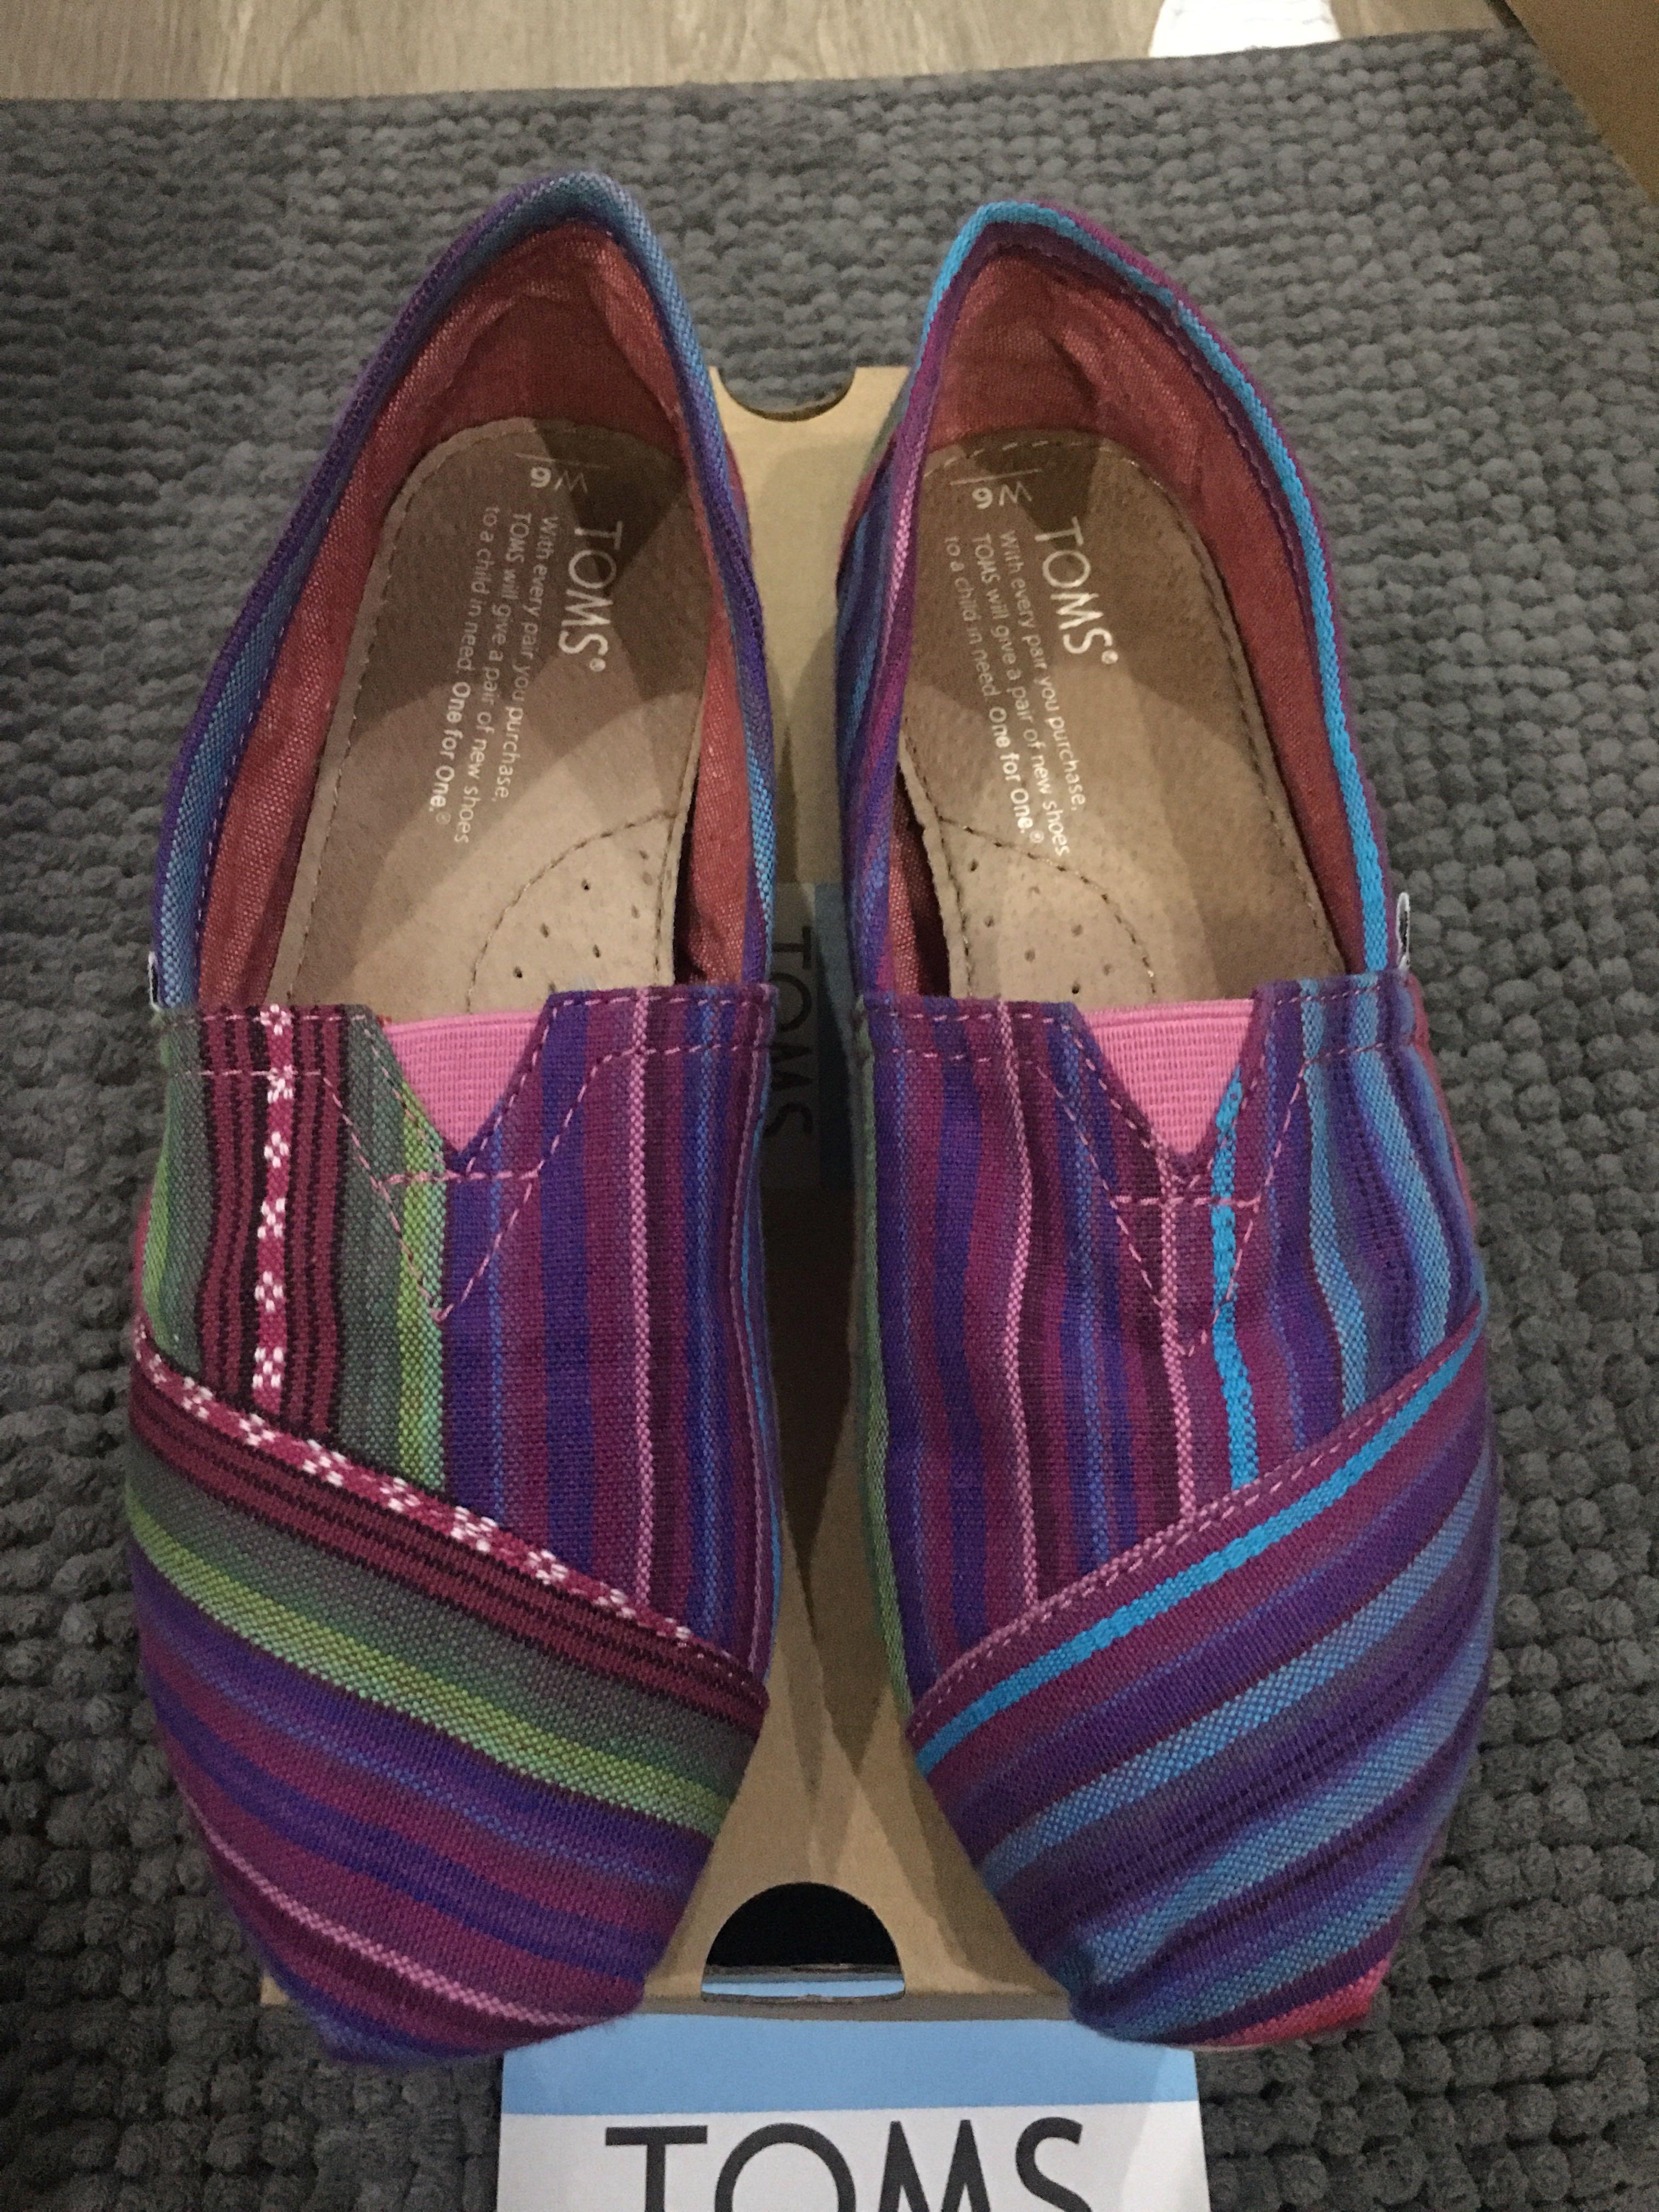 9ad5bcef552d Home · Women s Fashion · Shoes. photo photo photo photo photo